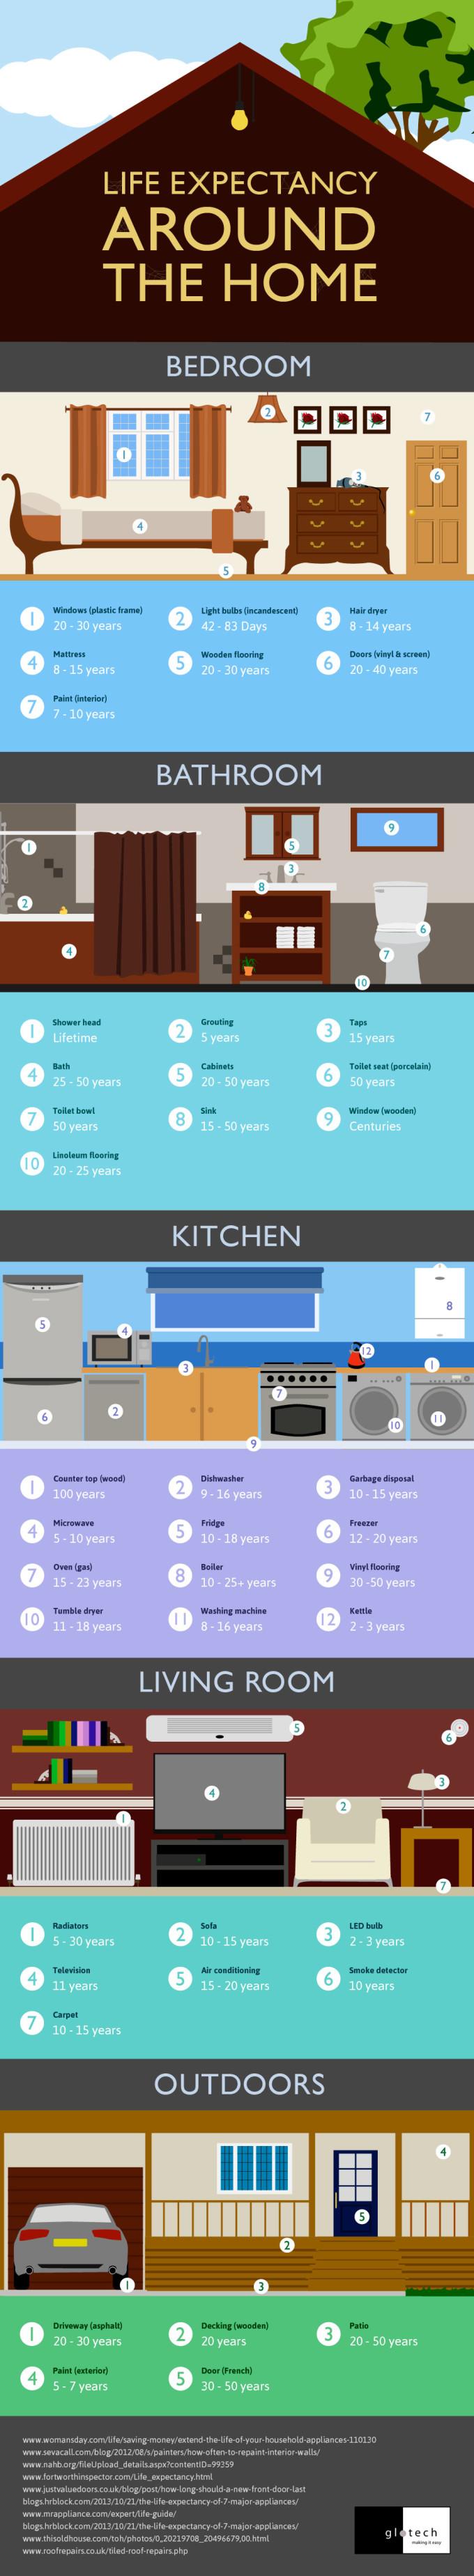 house life span